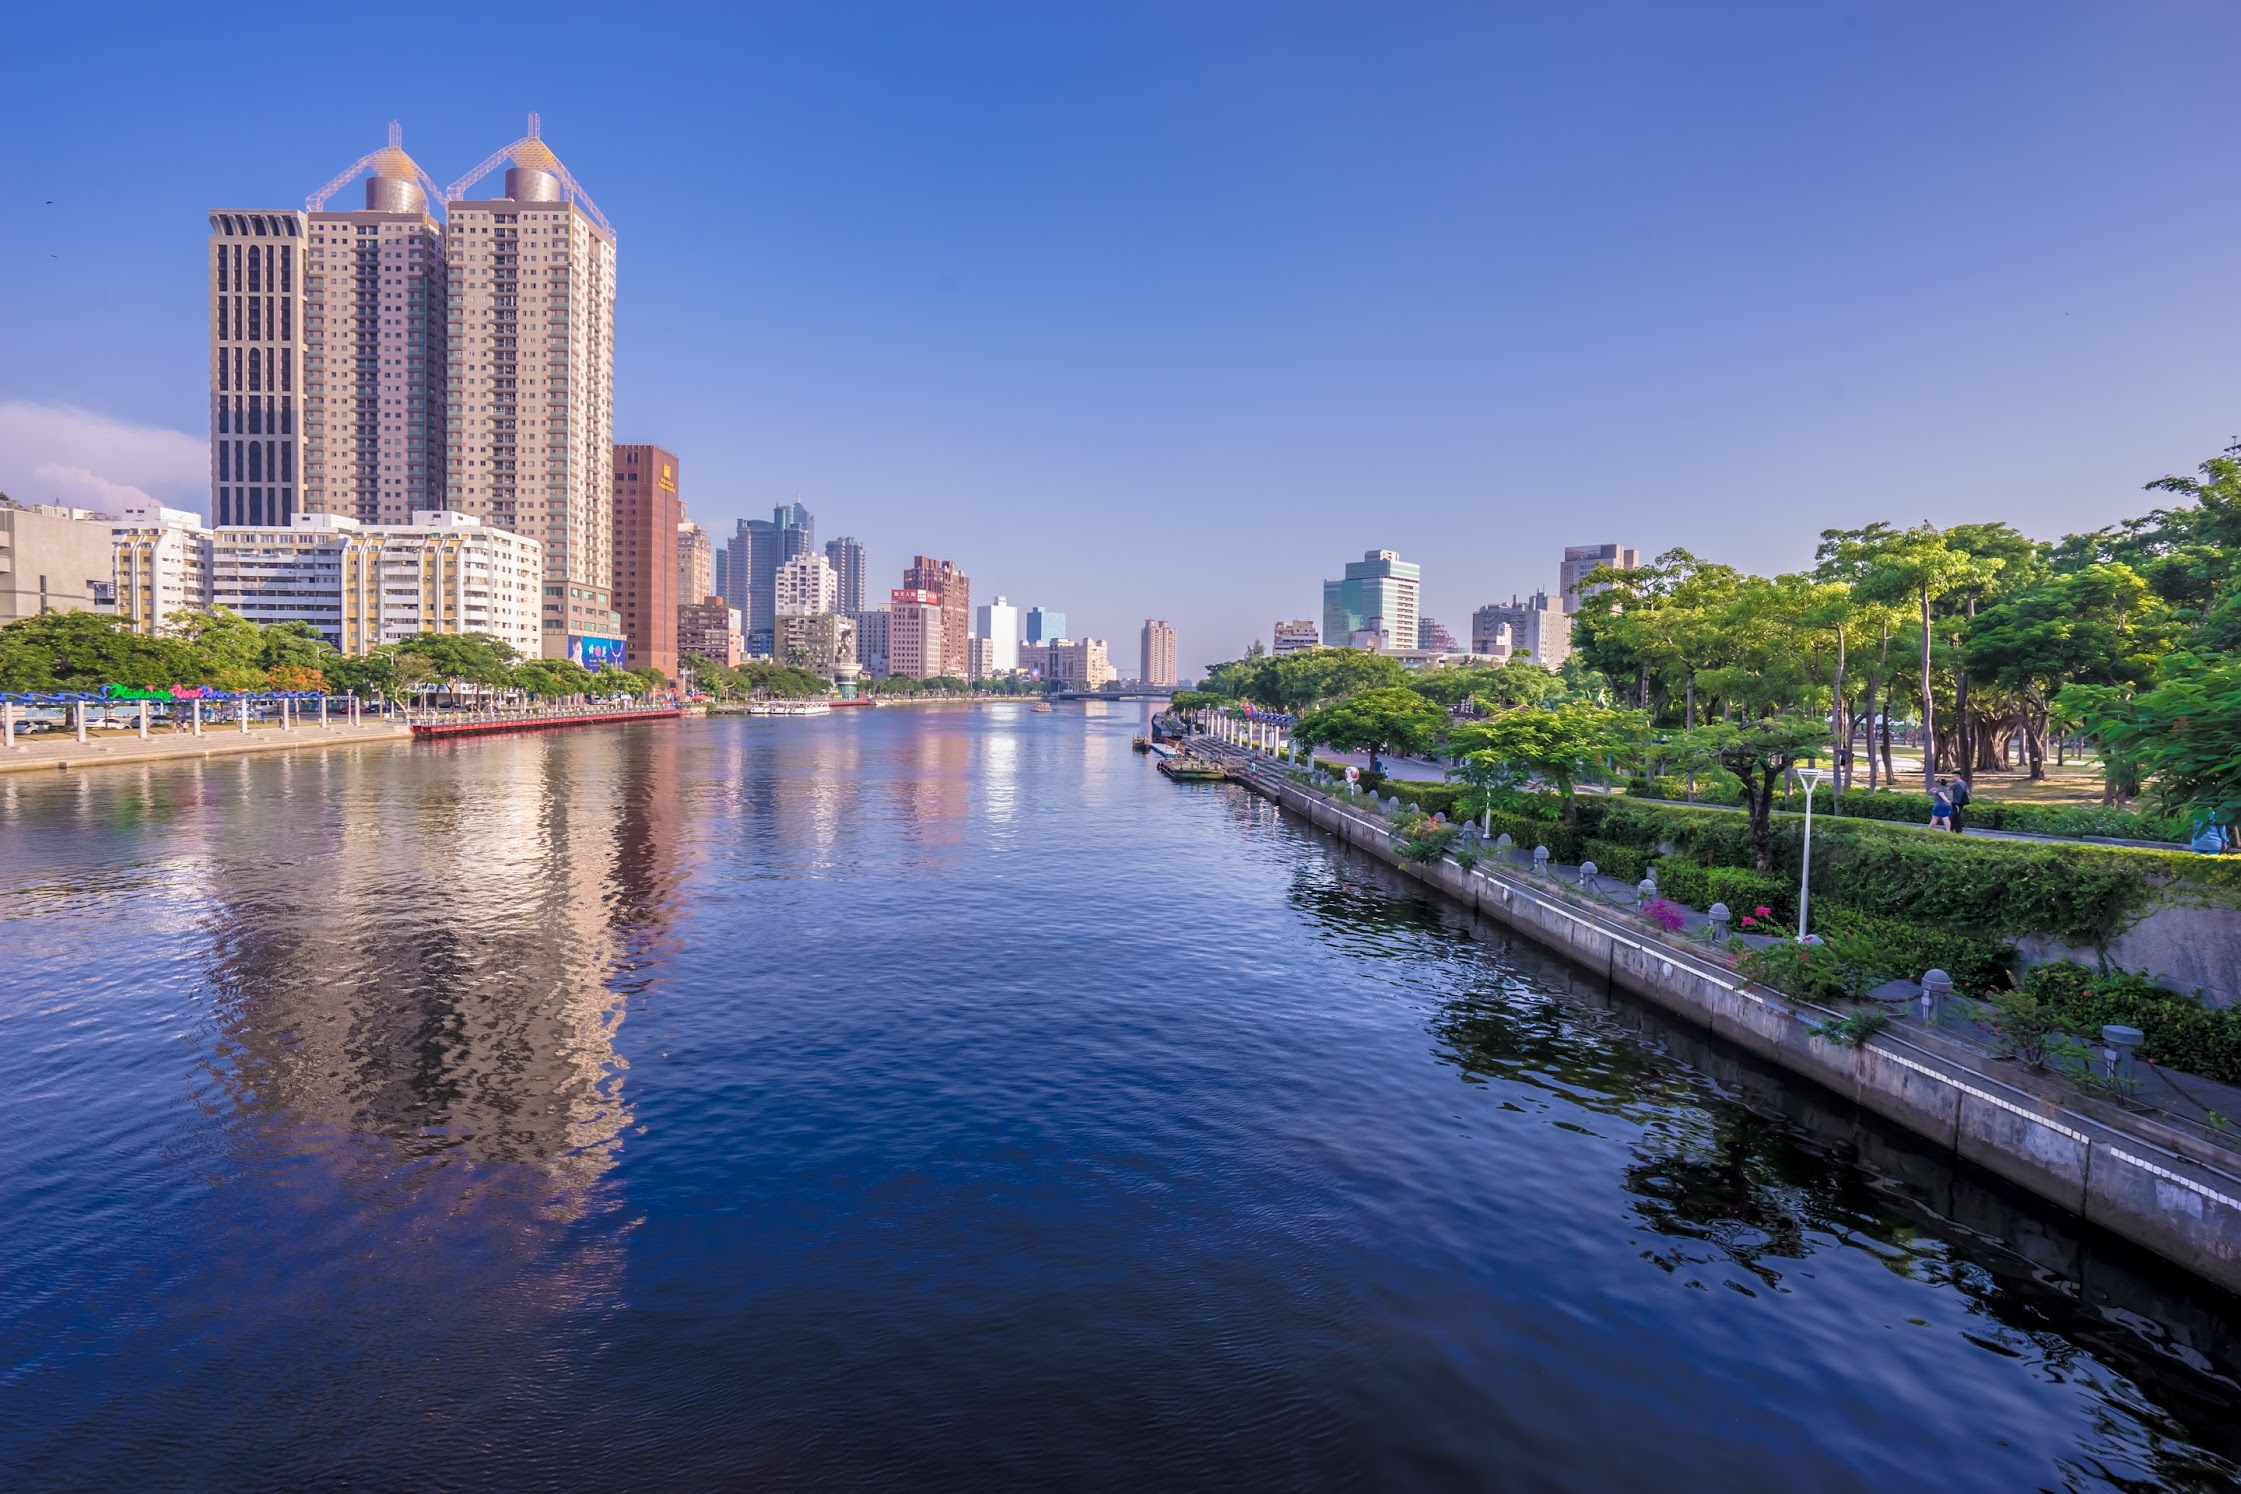 Taiwan Kaohsiung Love River1